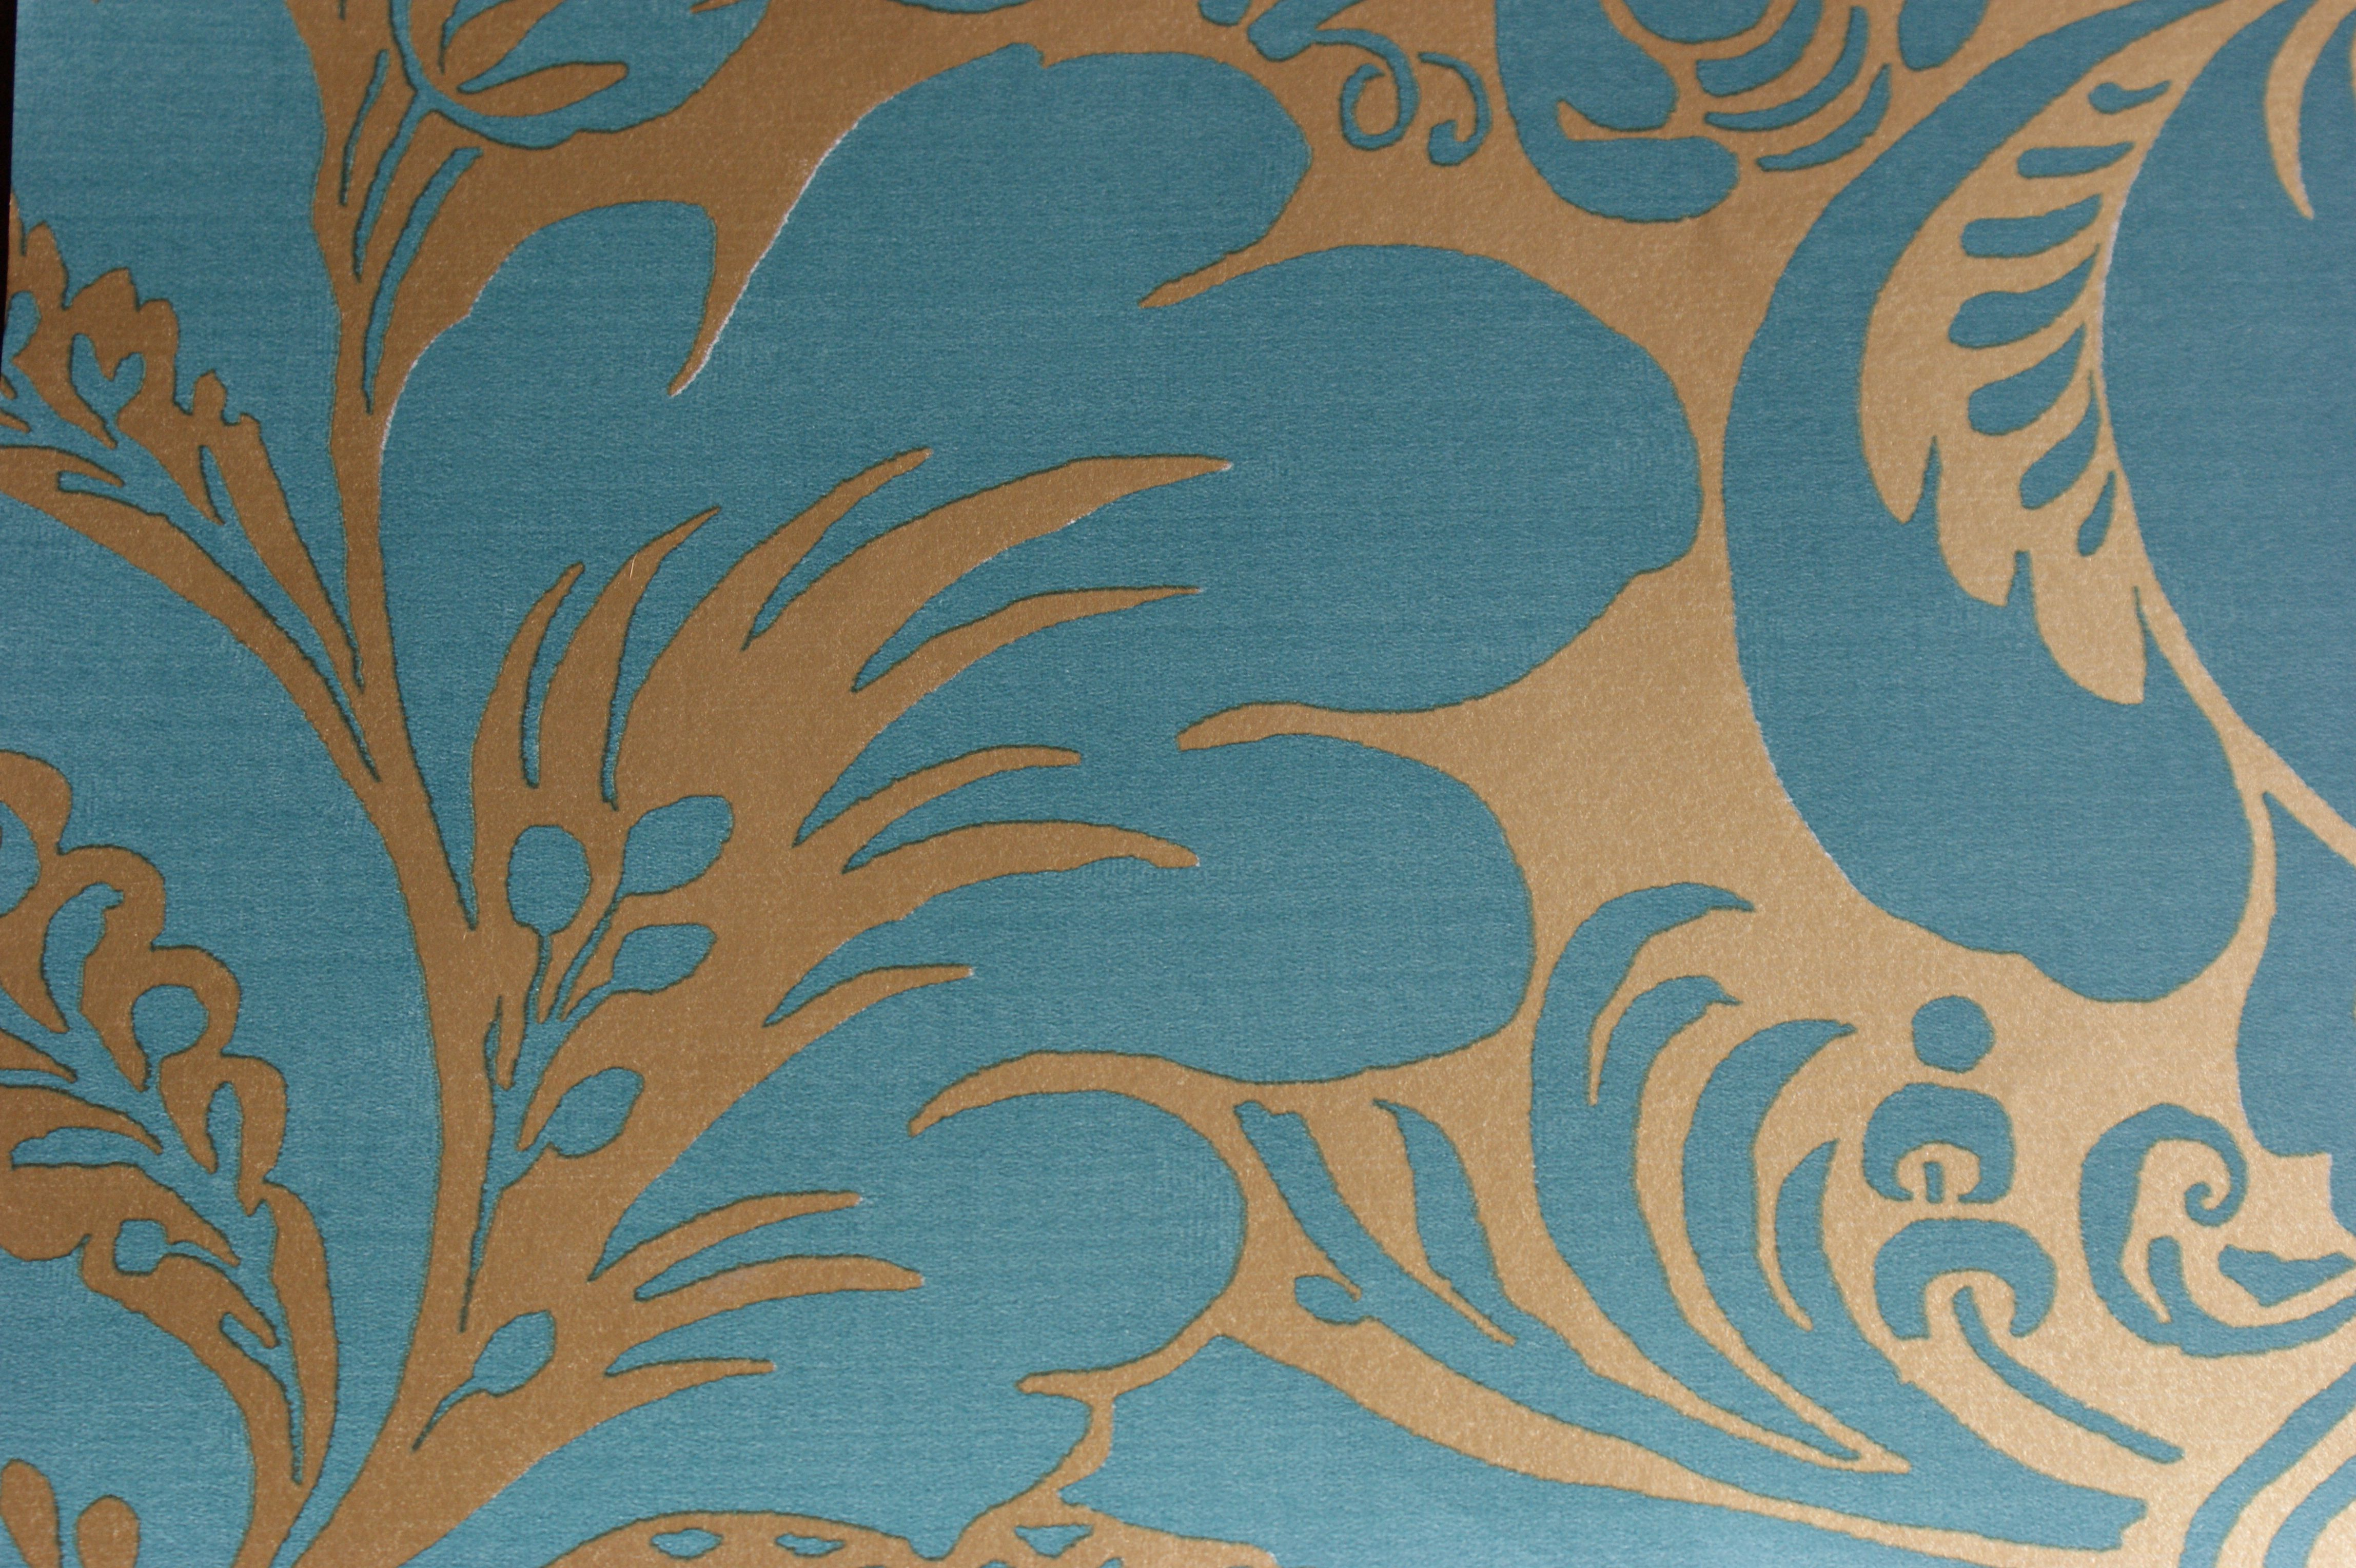 pinjanet mcvey on blues & pattern | pinterest